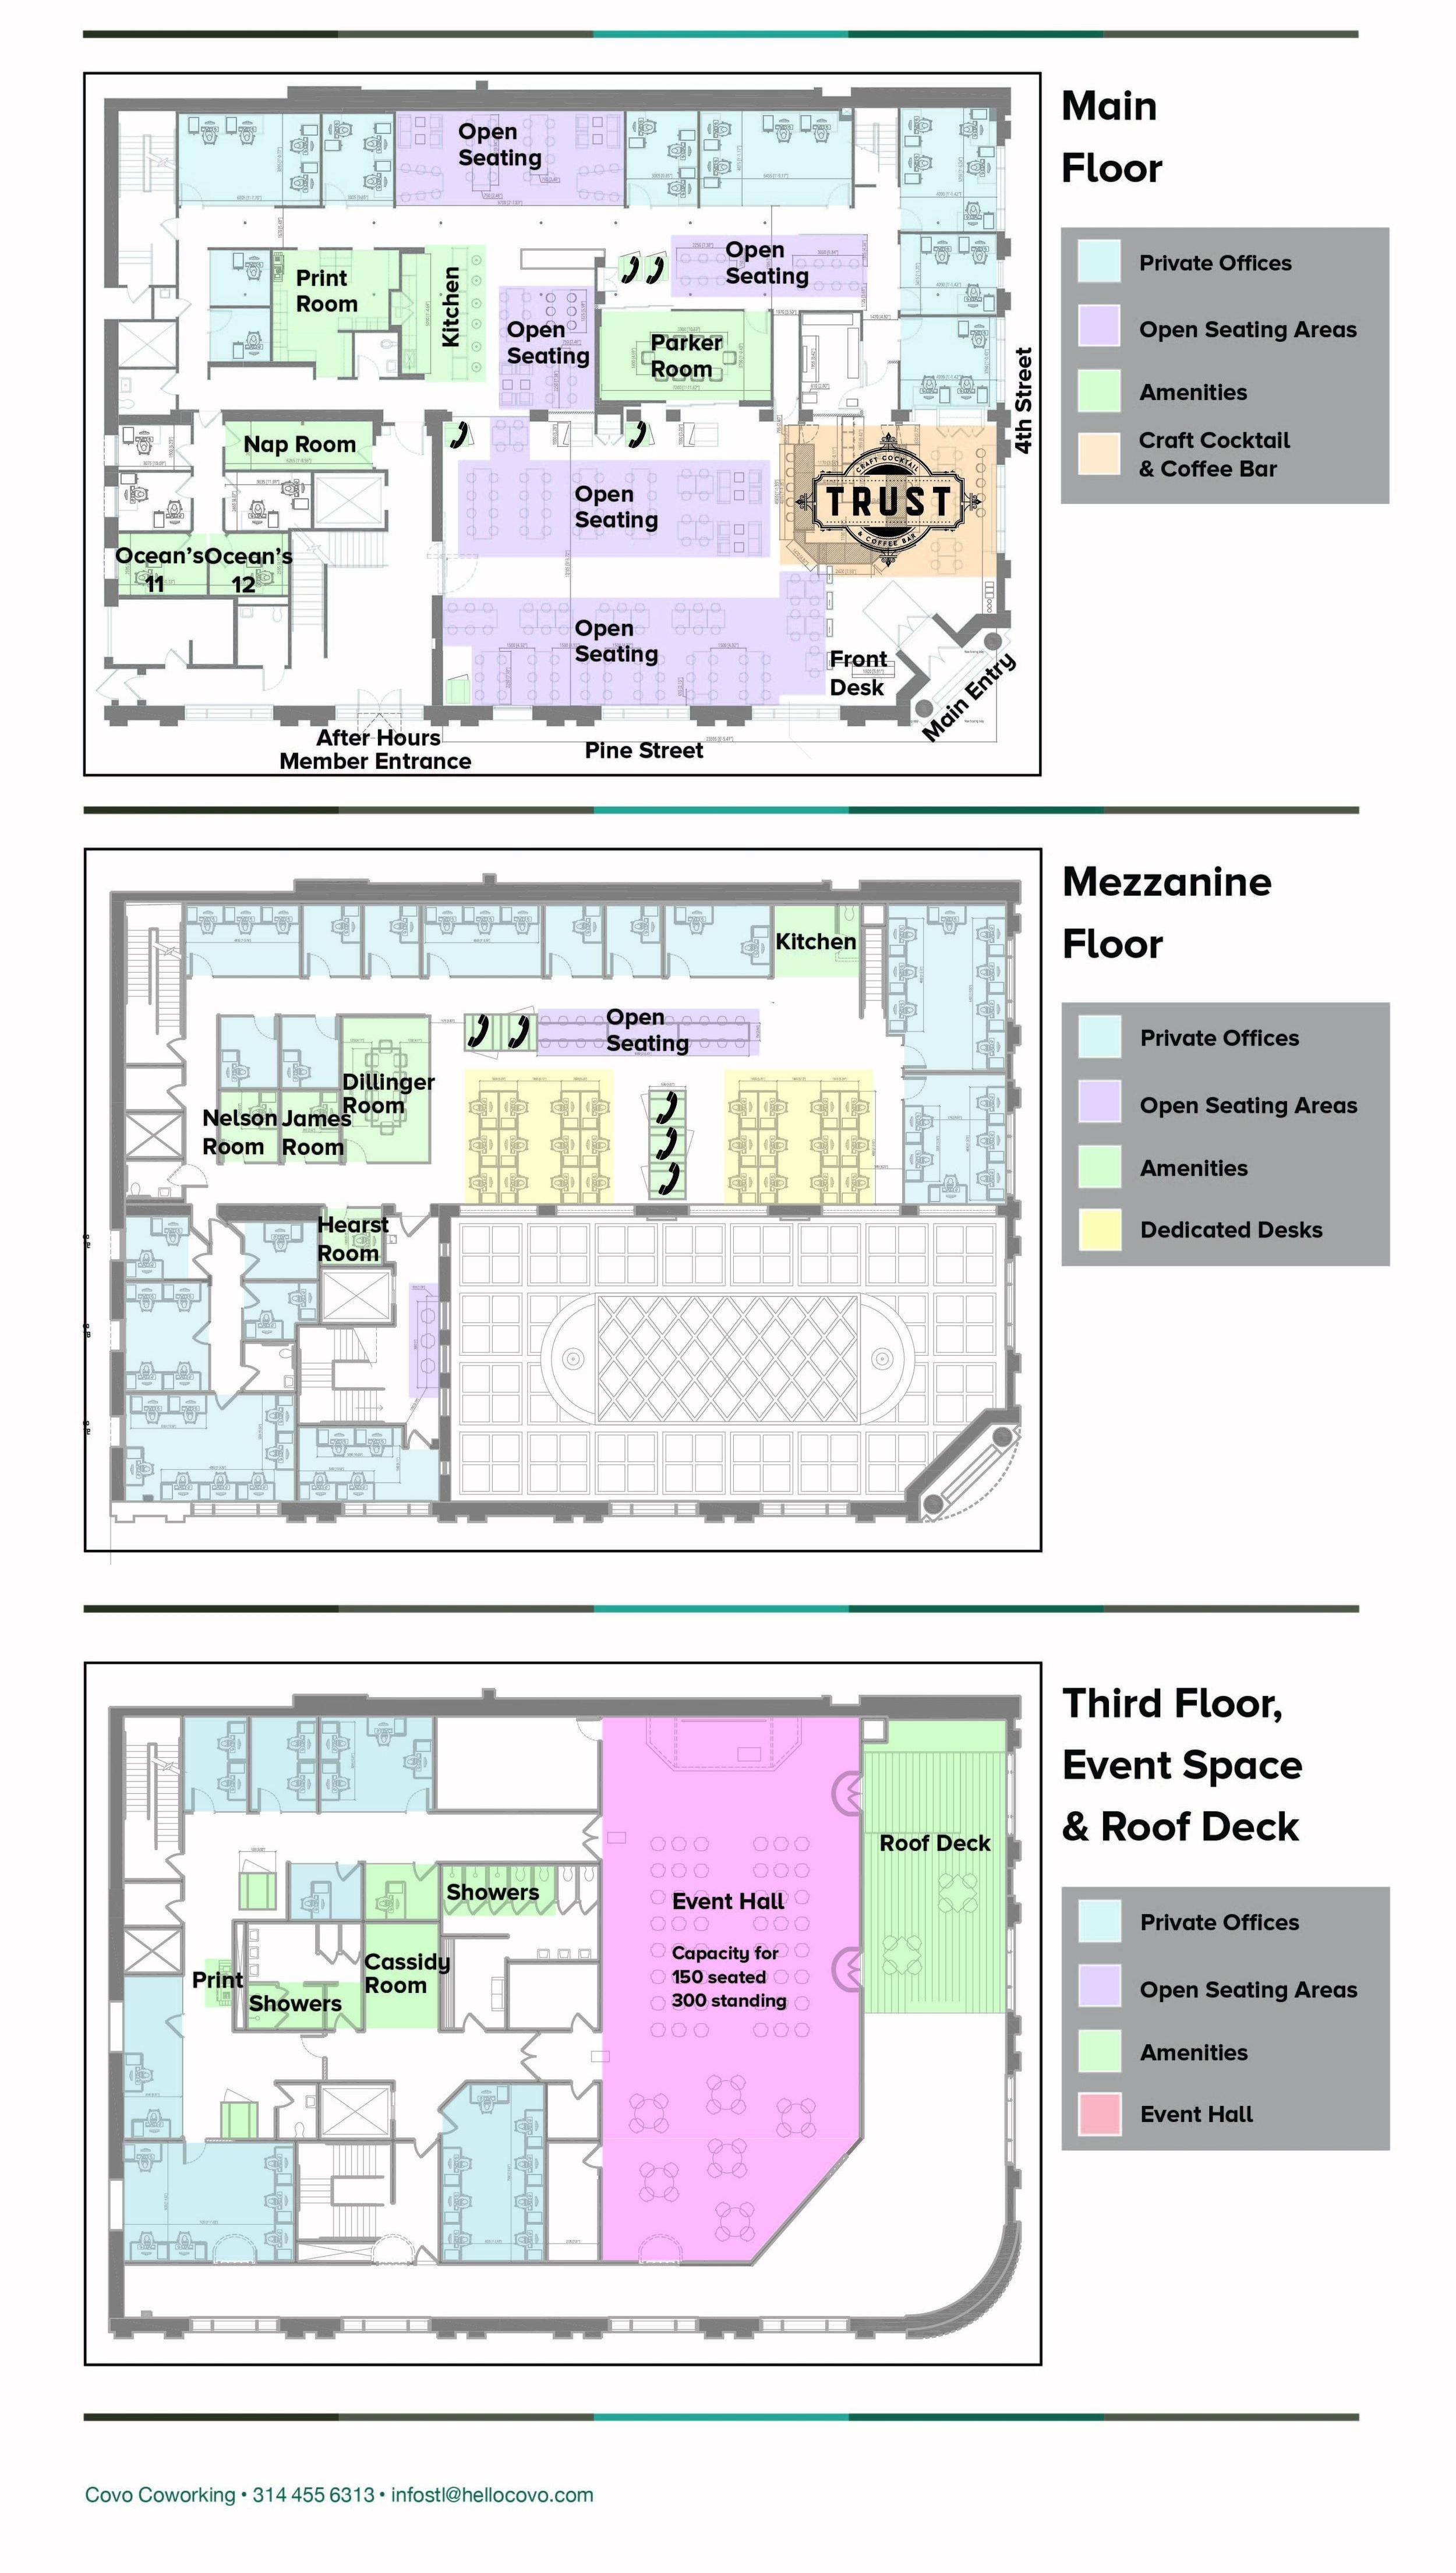 Membermaps.jpg